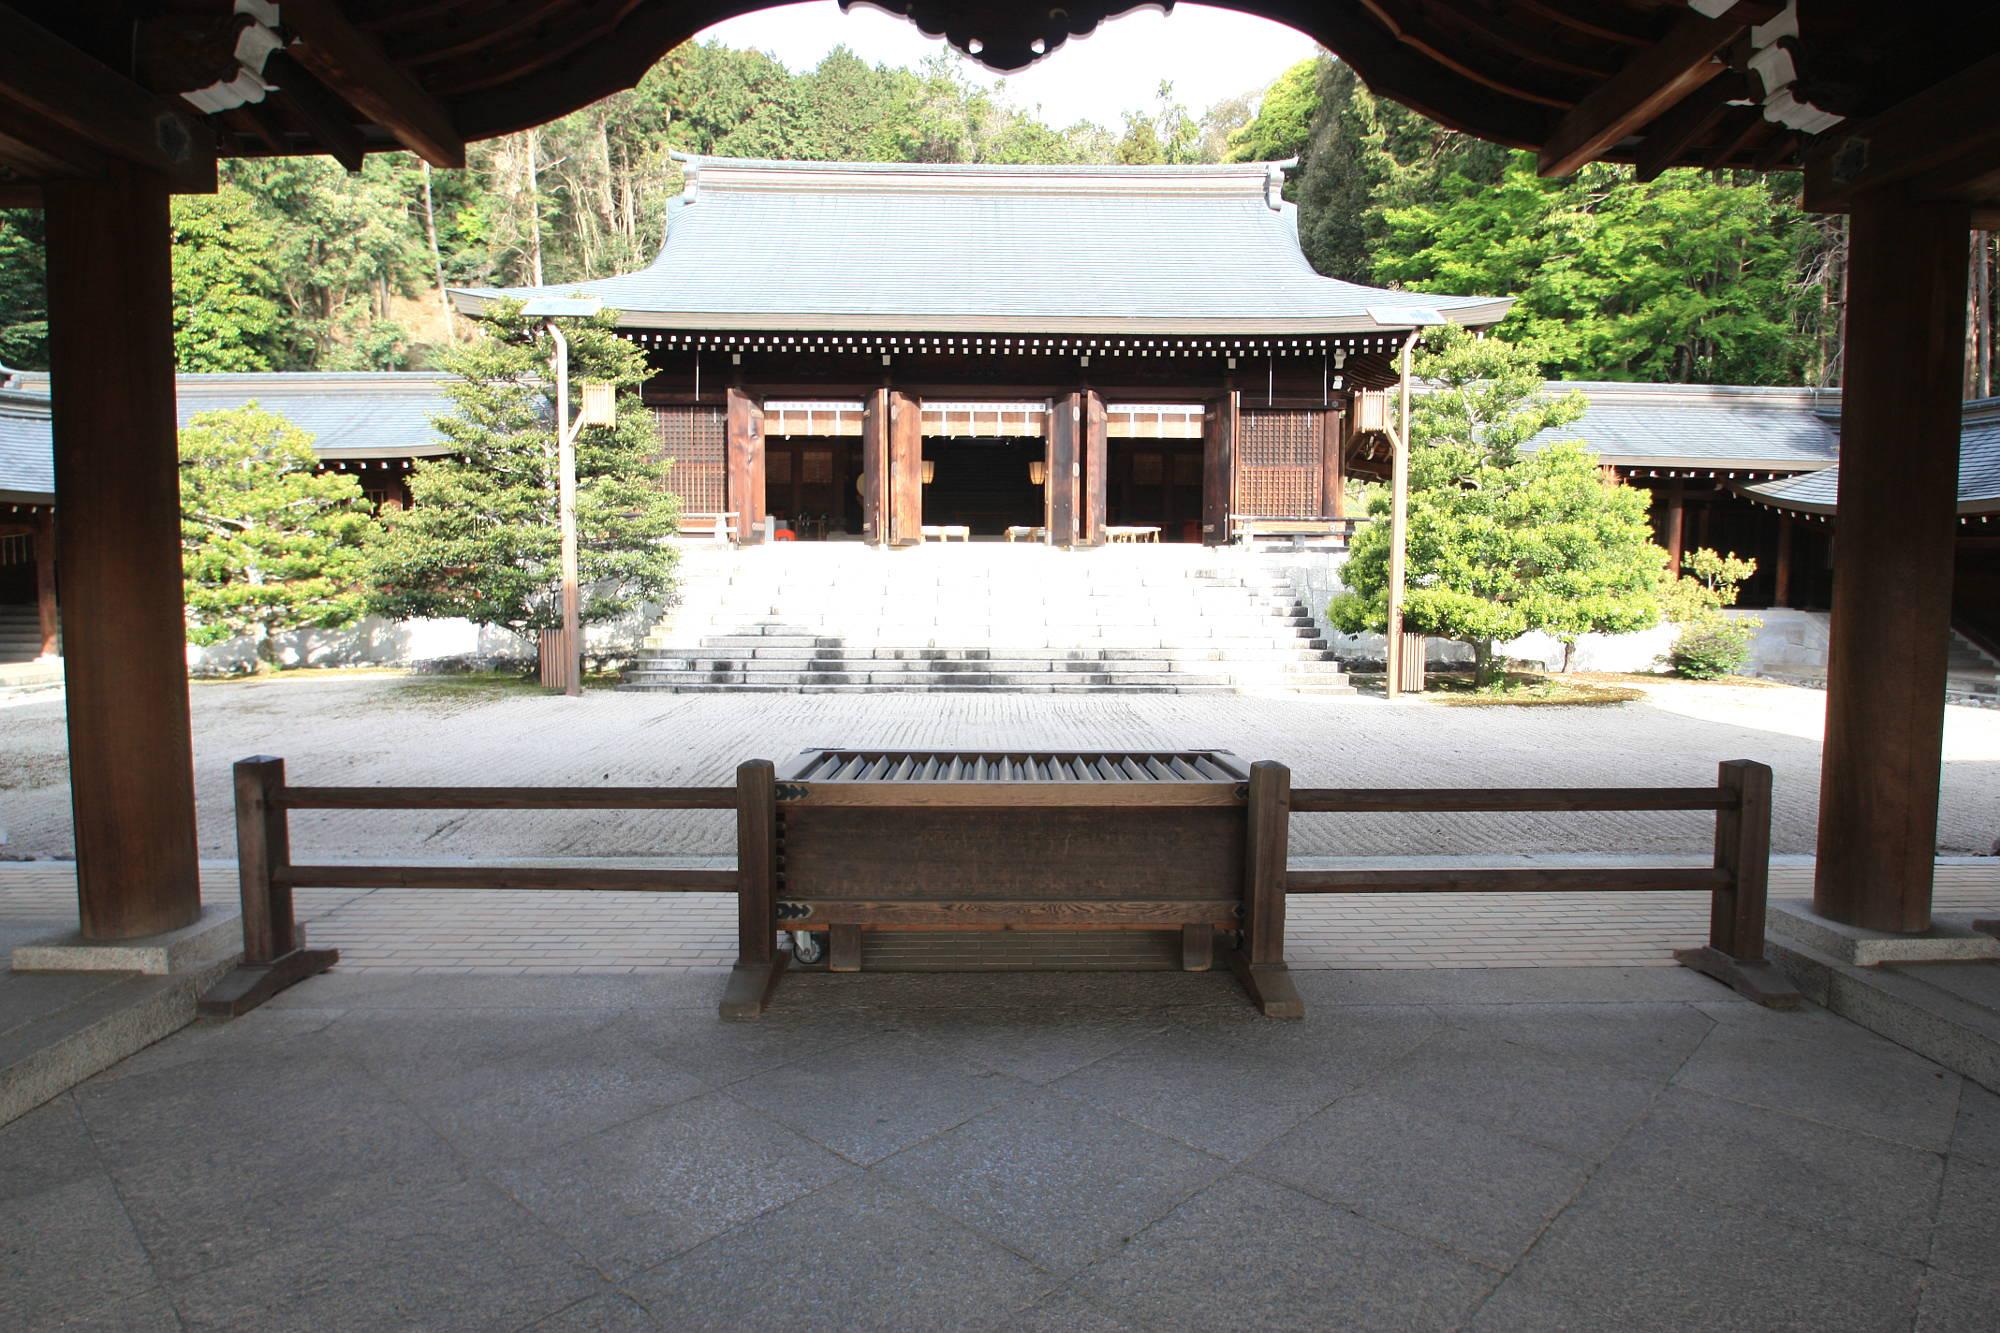 近江神宮の拝殿